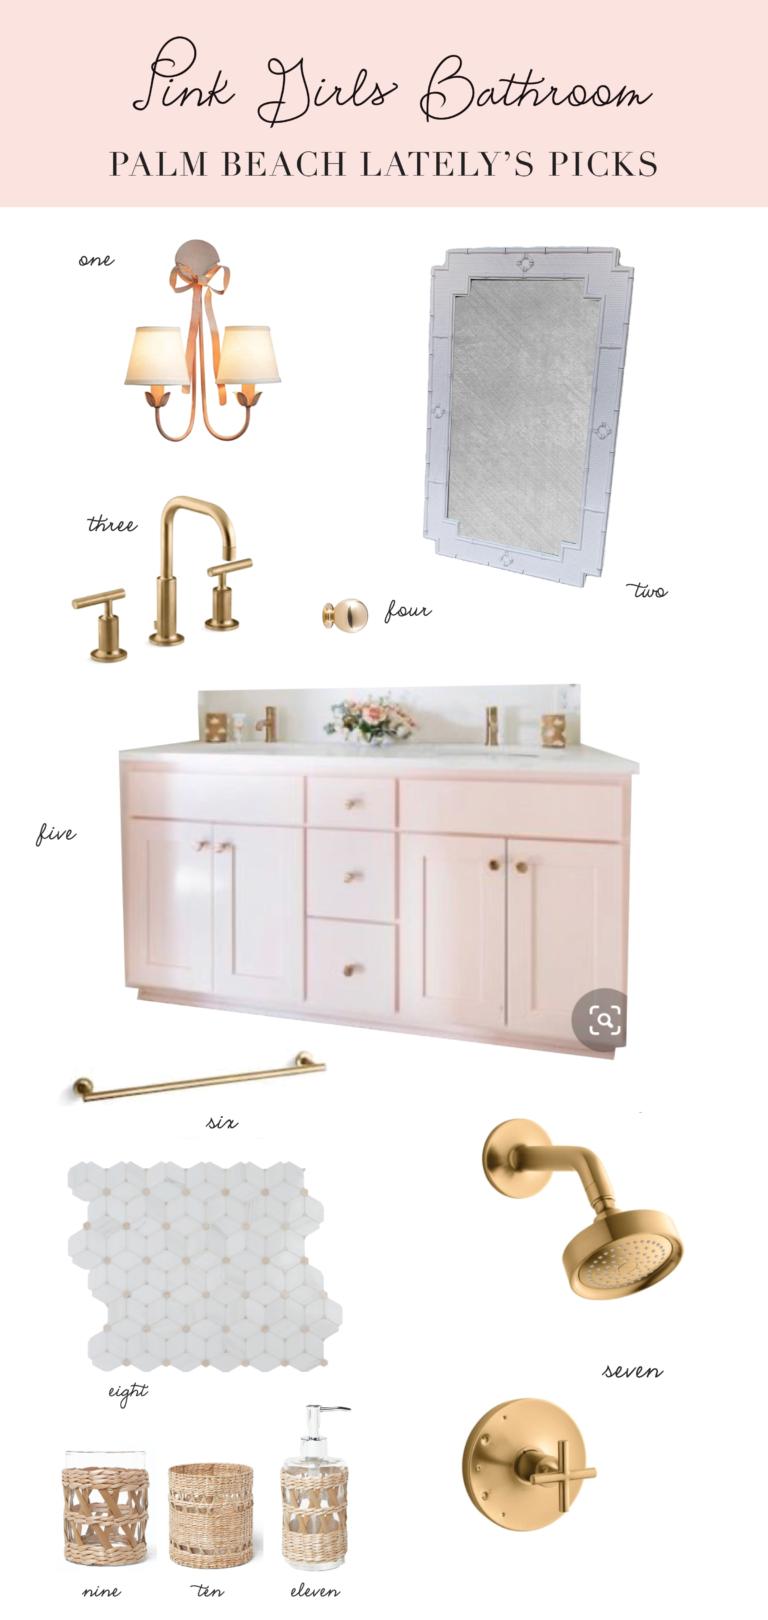 Home: Girls Pink Bathroom